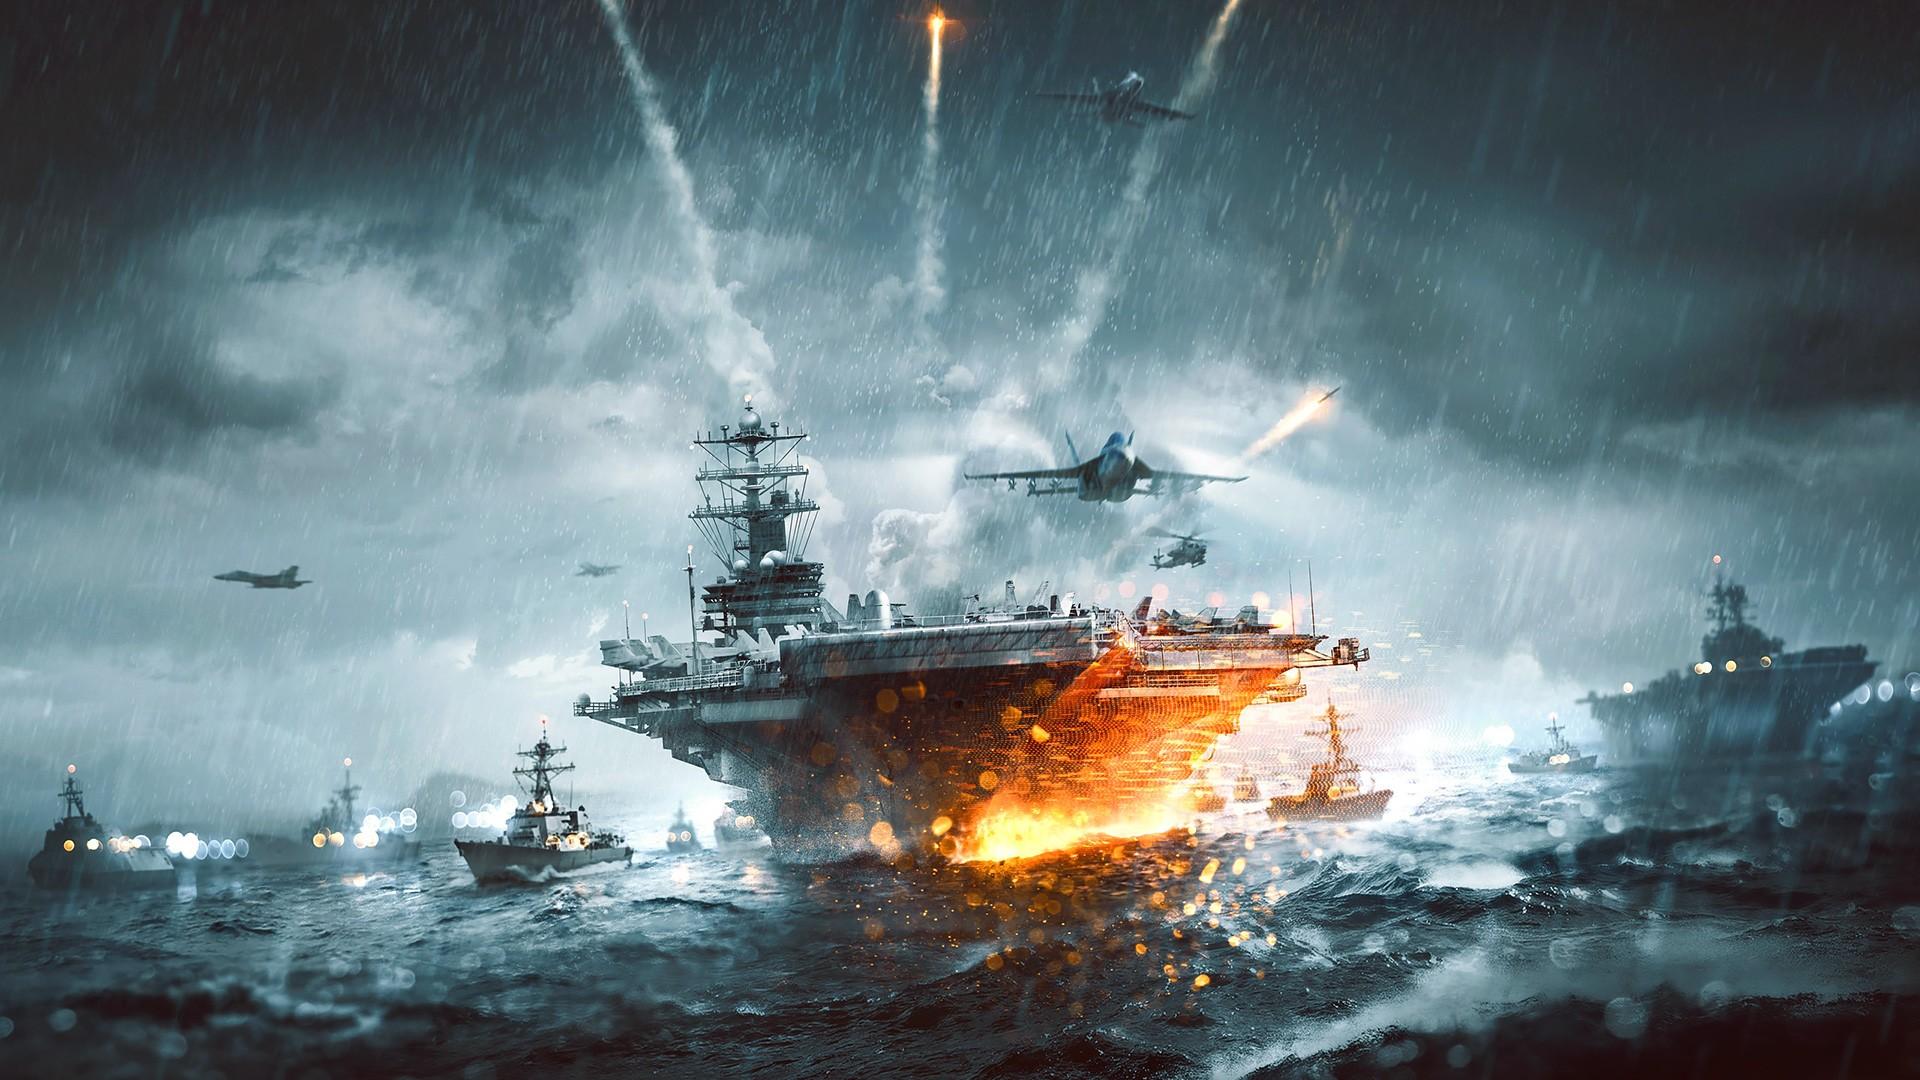 General 1920x1080 video games Battlefield 3 military aircraft carrier fleets aircraft military aircraft sea rain McDonnell Douglas F/A-18 Hornet